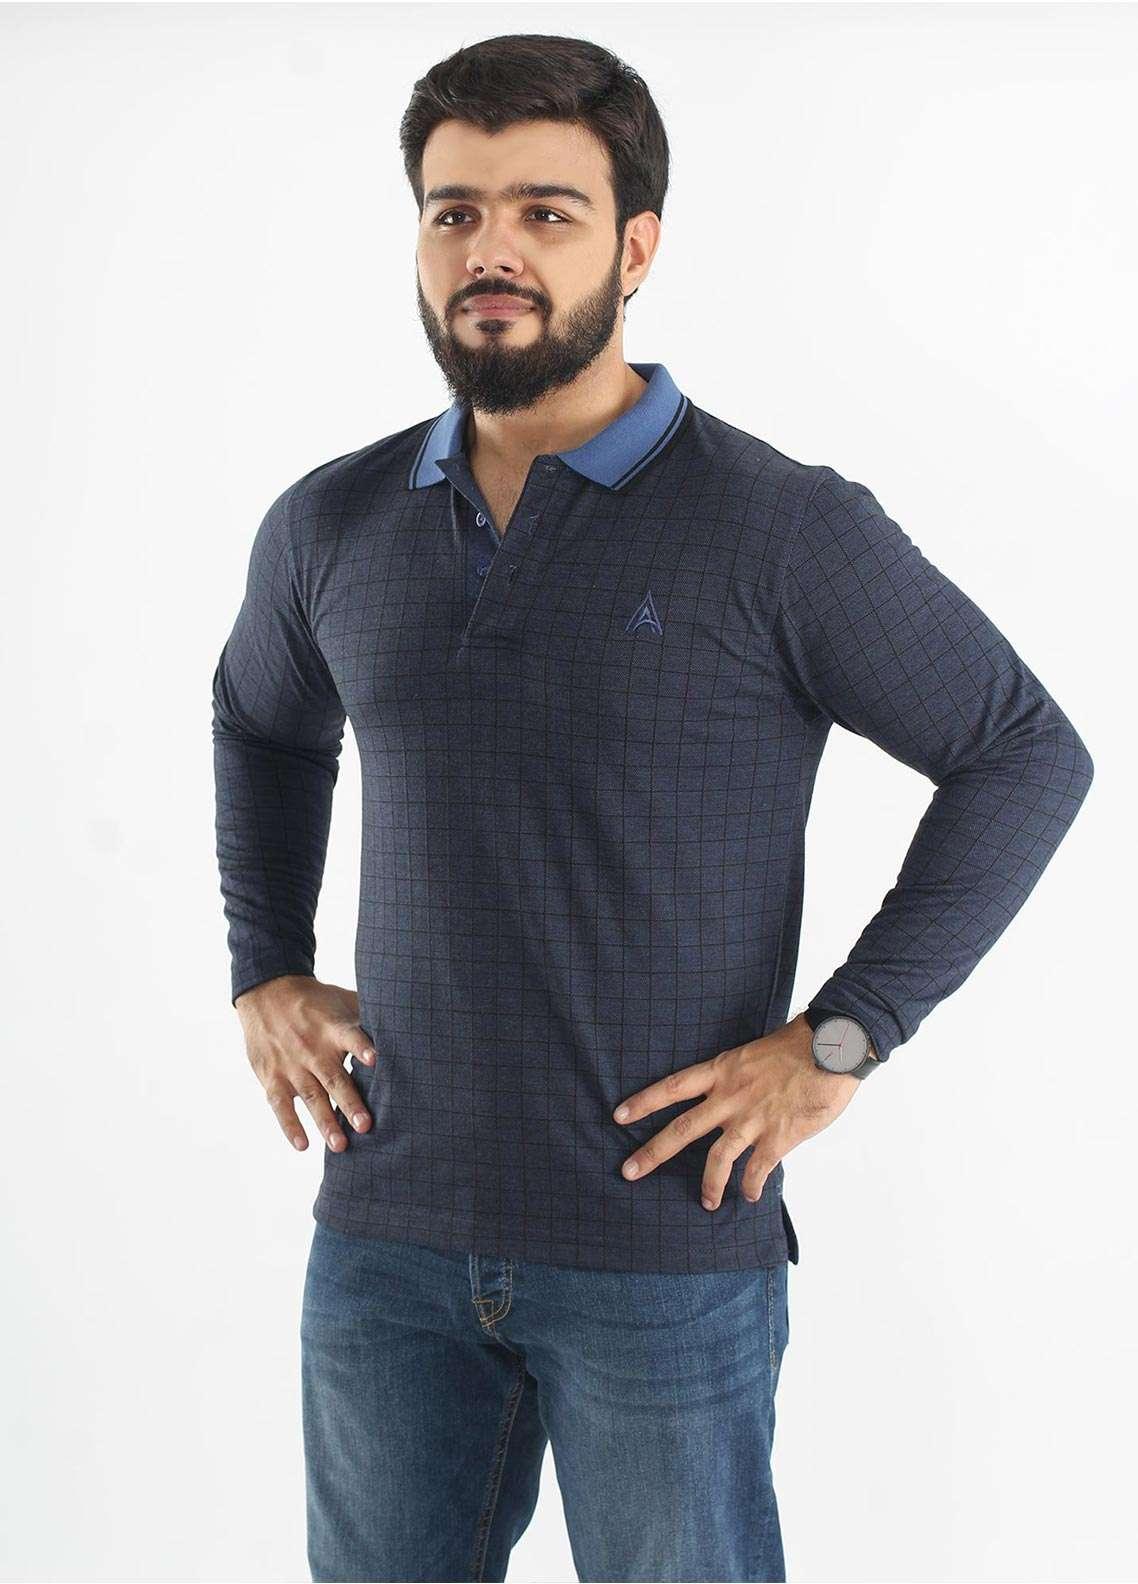 Anchor Jersey Polo Men T-Shirts - Blue A-192